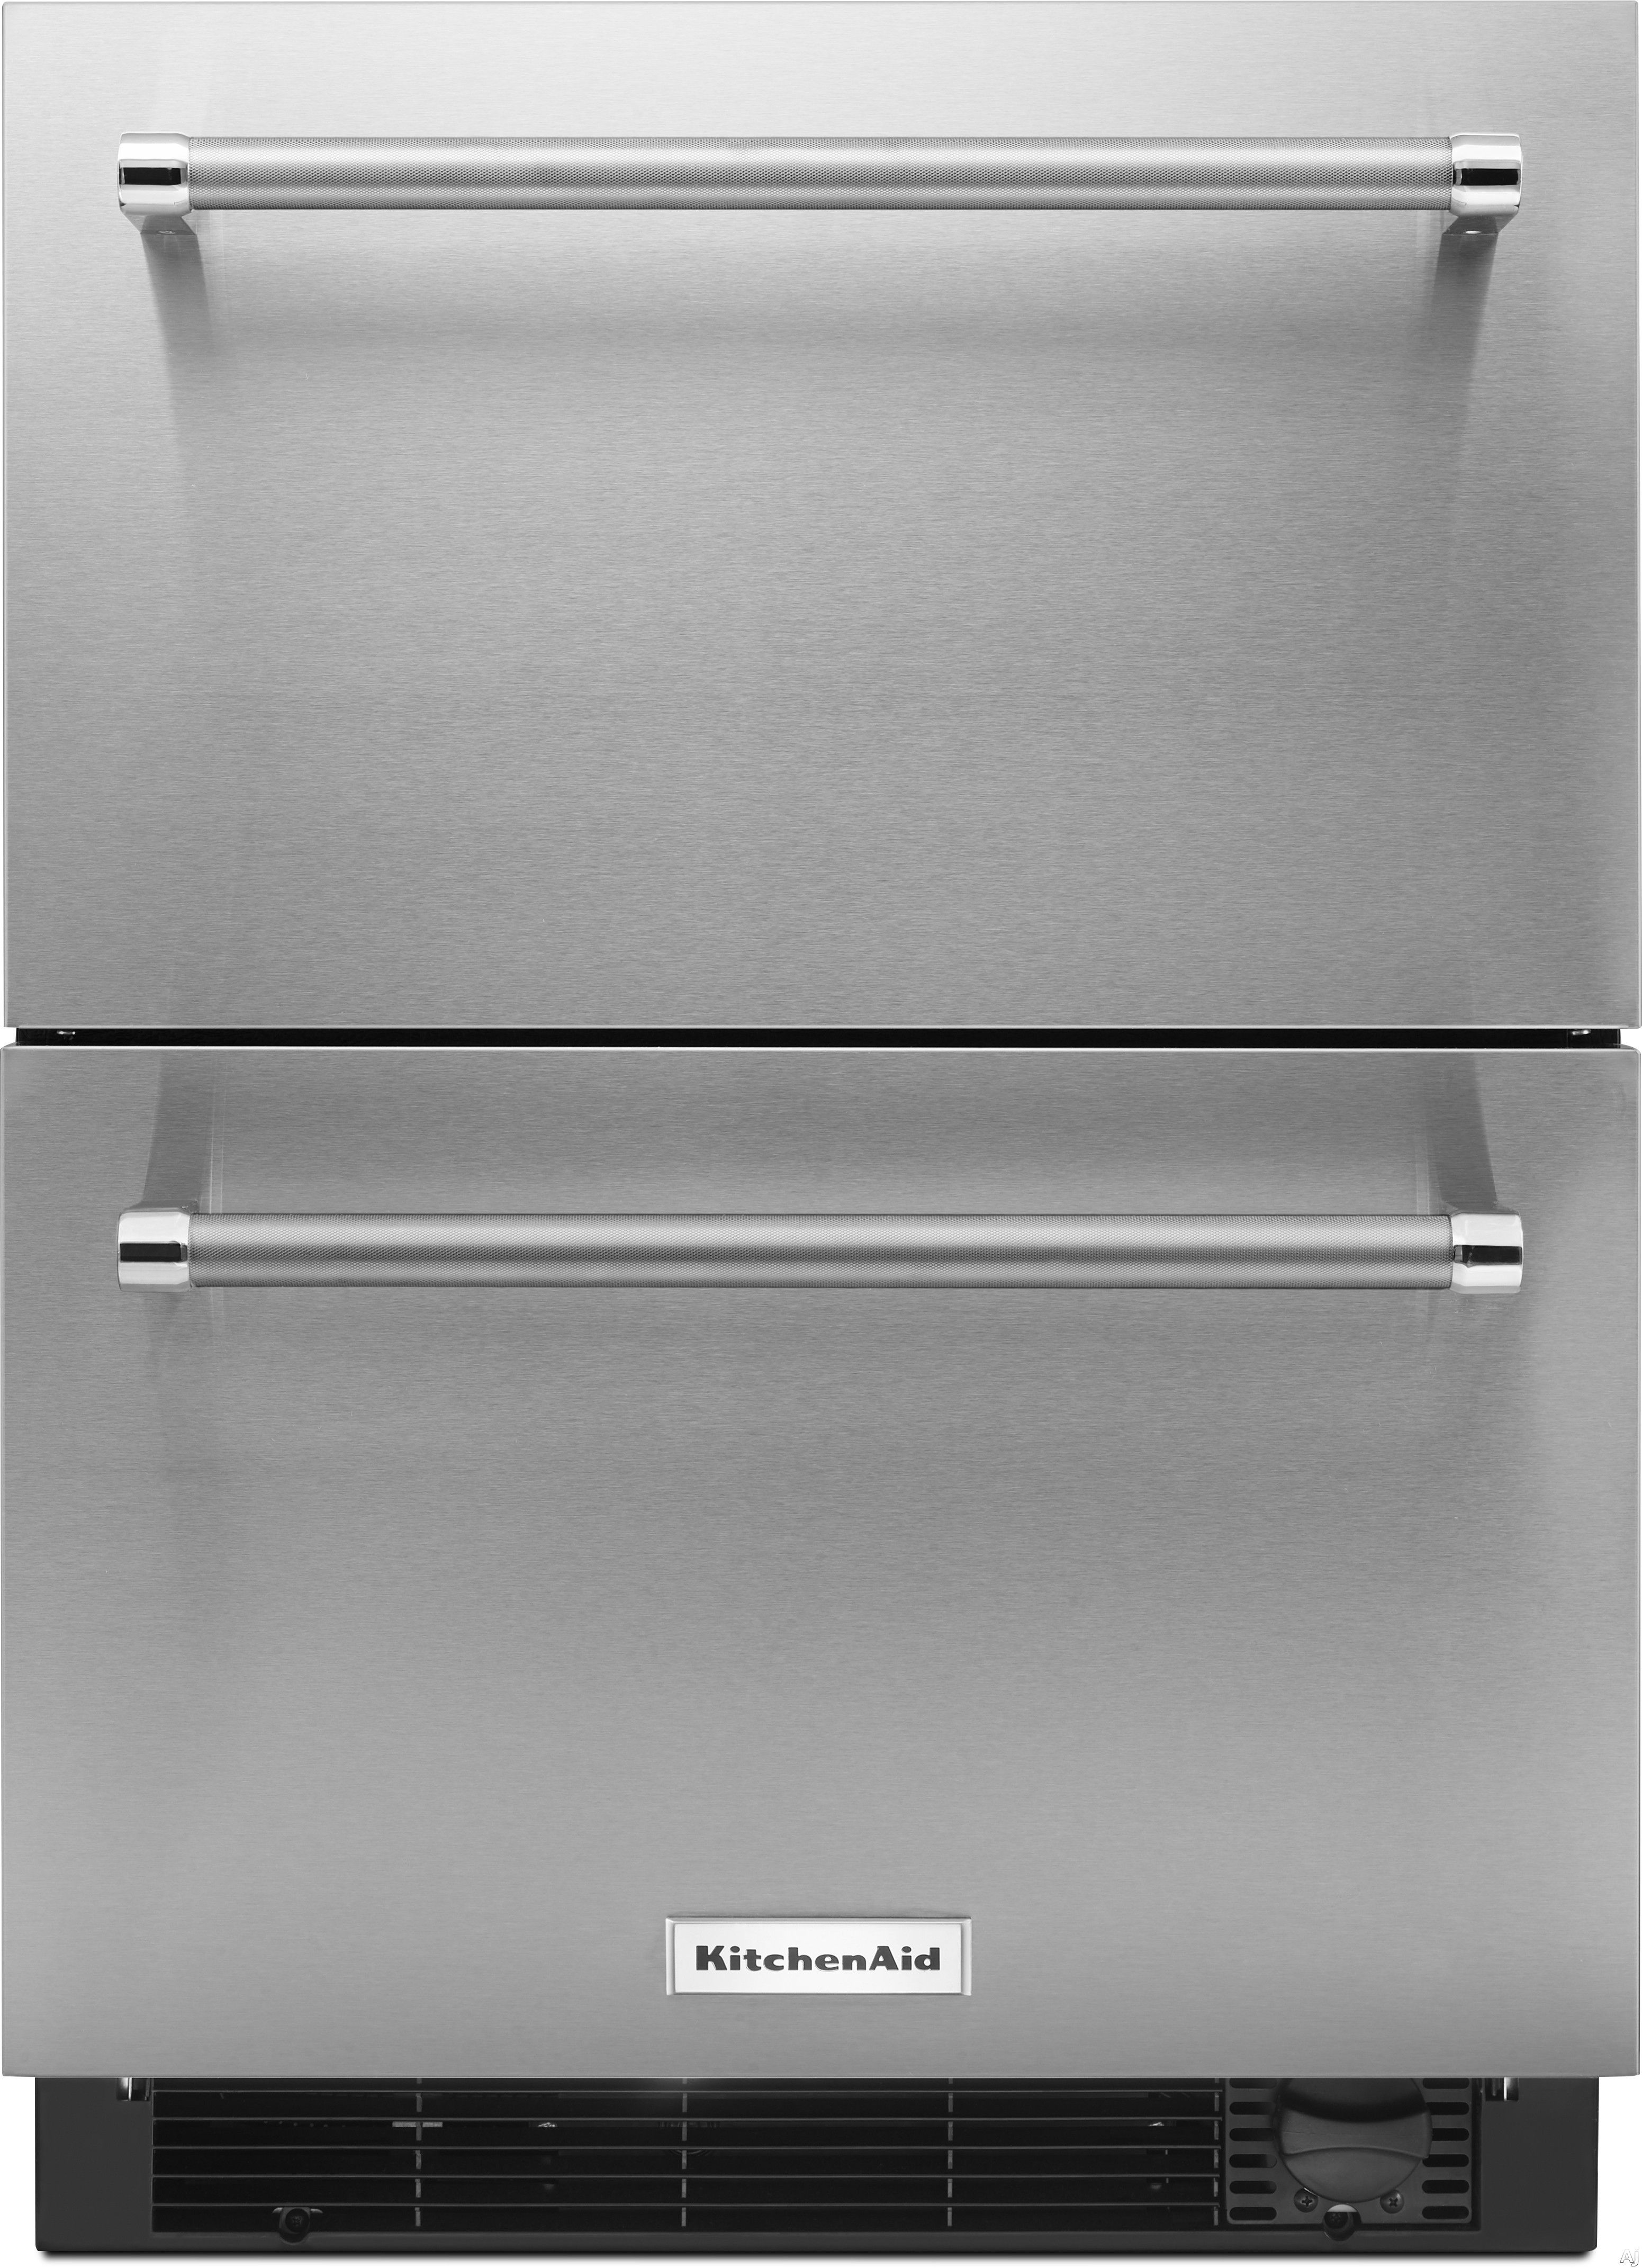 Kitchenaid Kudf204e 4 7 Cu Ft Undercounter Refrigerated Drawers With Freezer Refrigerator Drawers Undercounter Refrigerator Drawers Undercounter Refrigerator